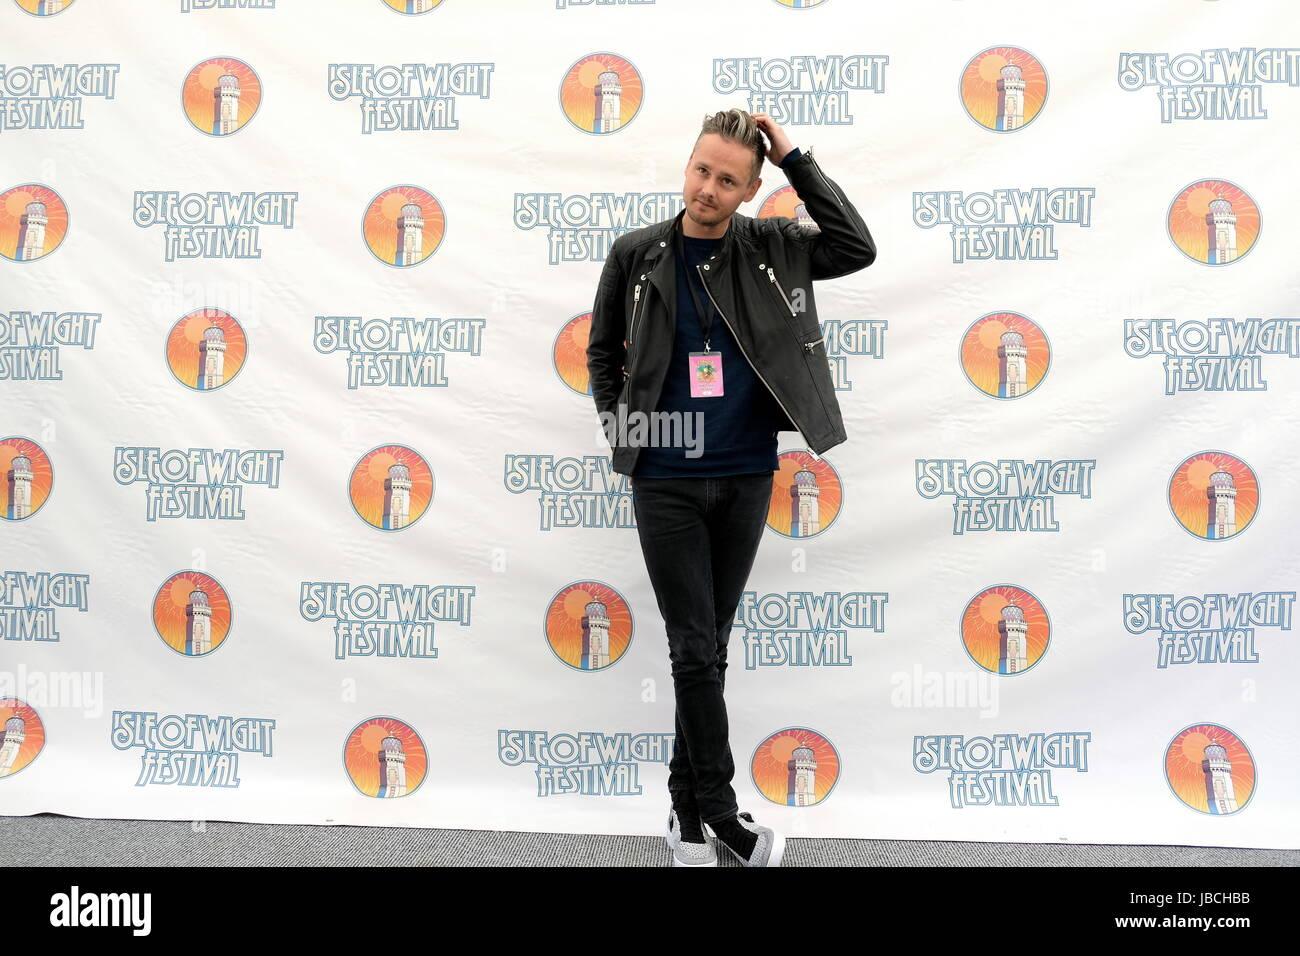 Newport, Isle of Wight, UK. 10th June, 2017. Isle of Wight Festival Day 3 -  Tom Chaplin.British folk singer  who - Stock Image